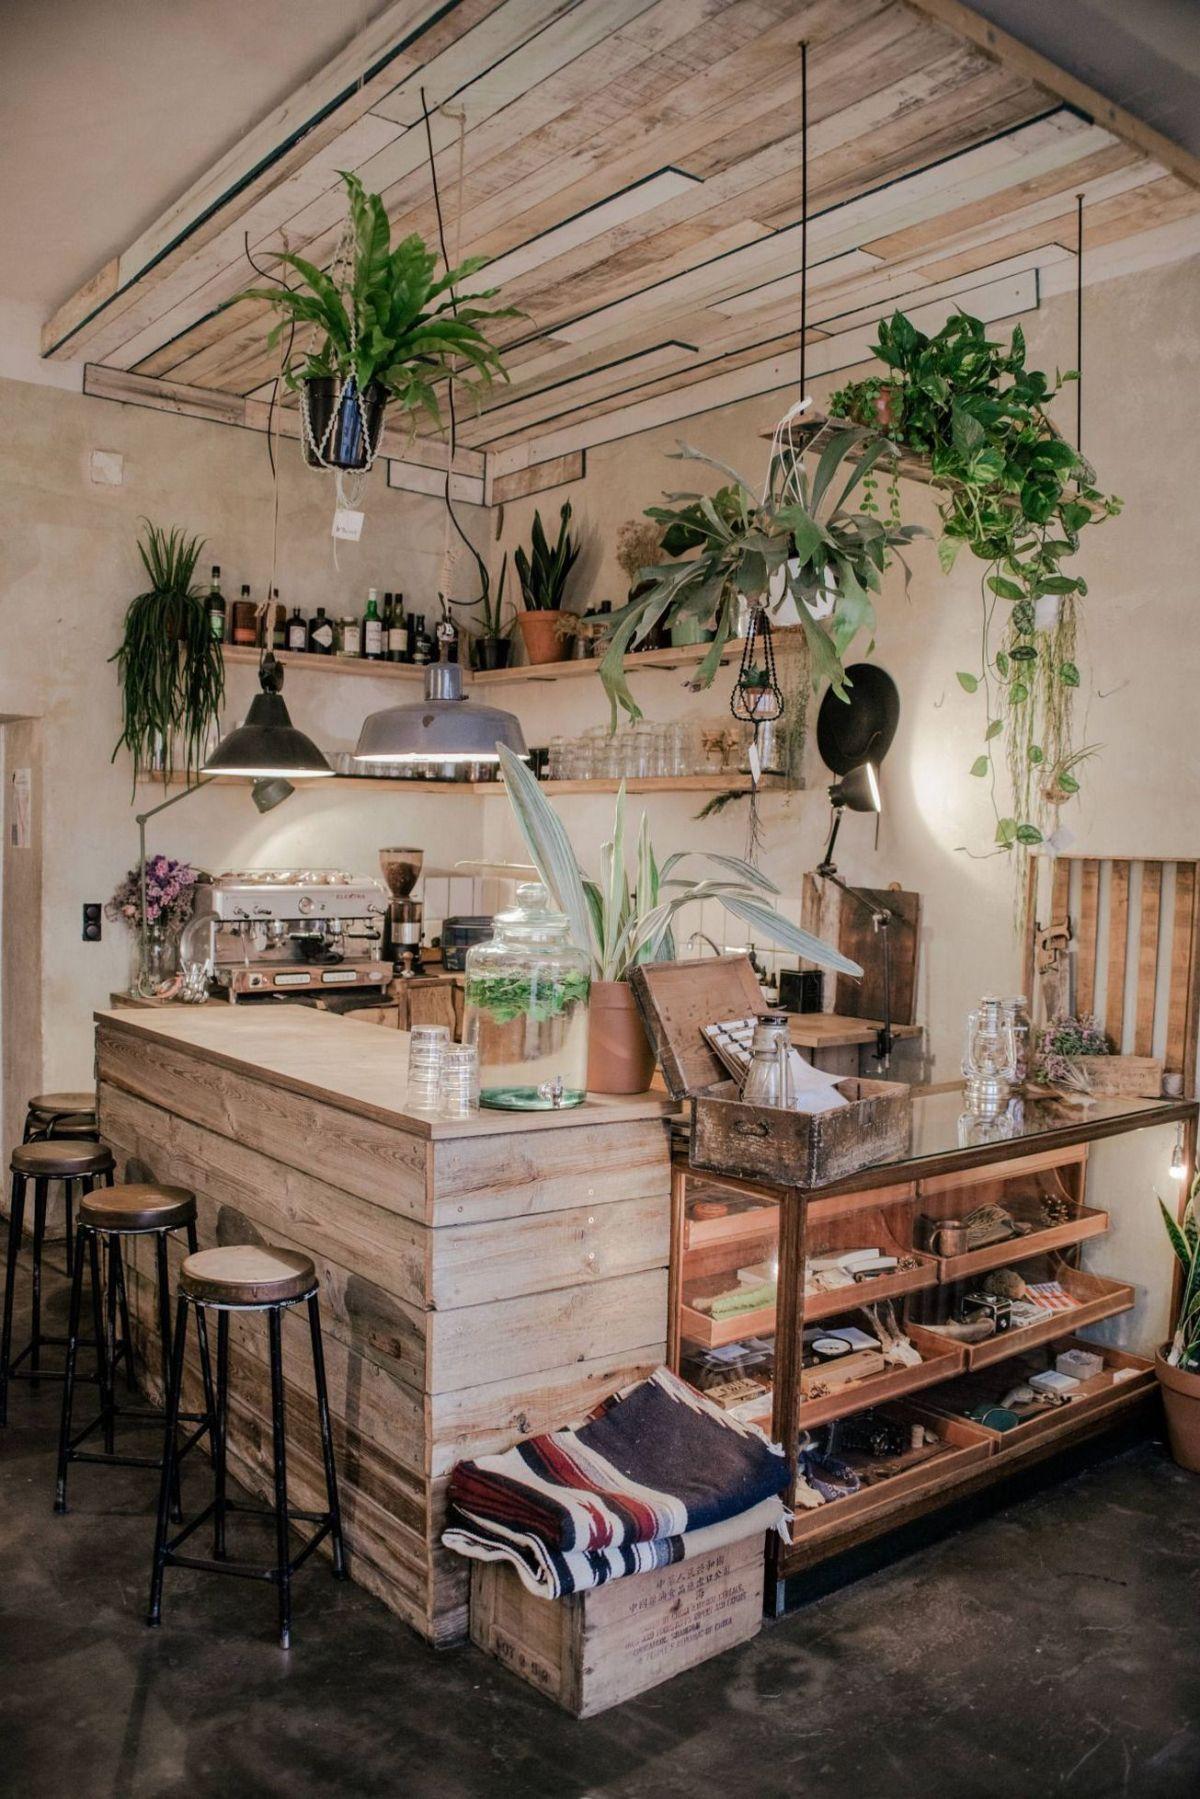 Coffee shop decorating ideas 63 - We Otomotive Info